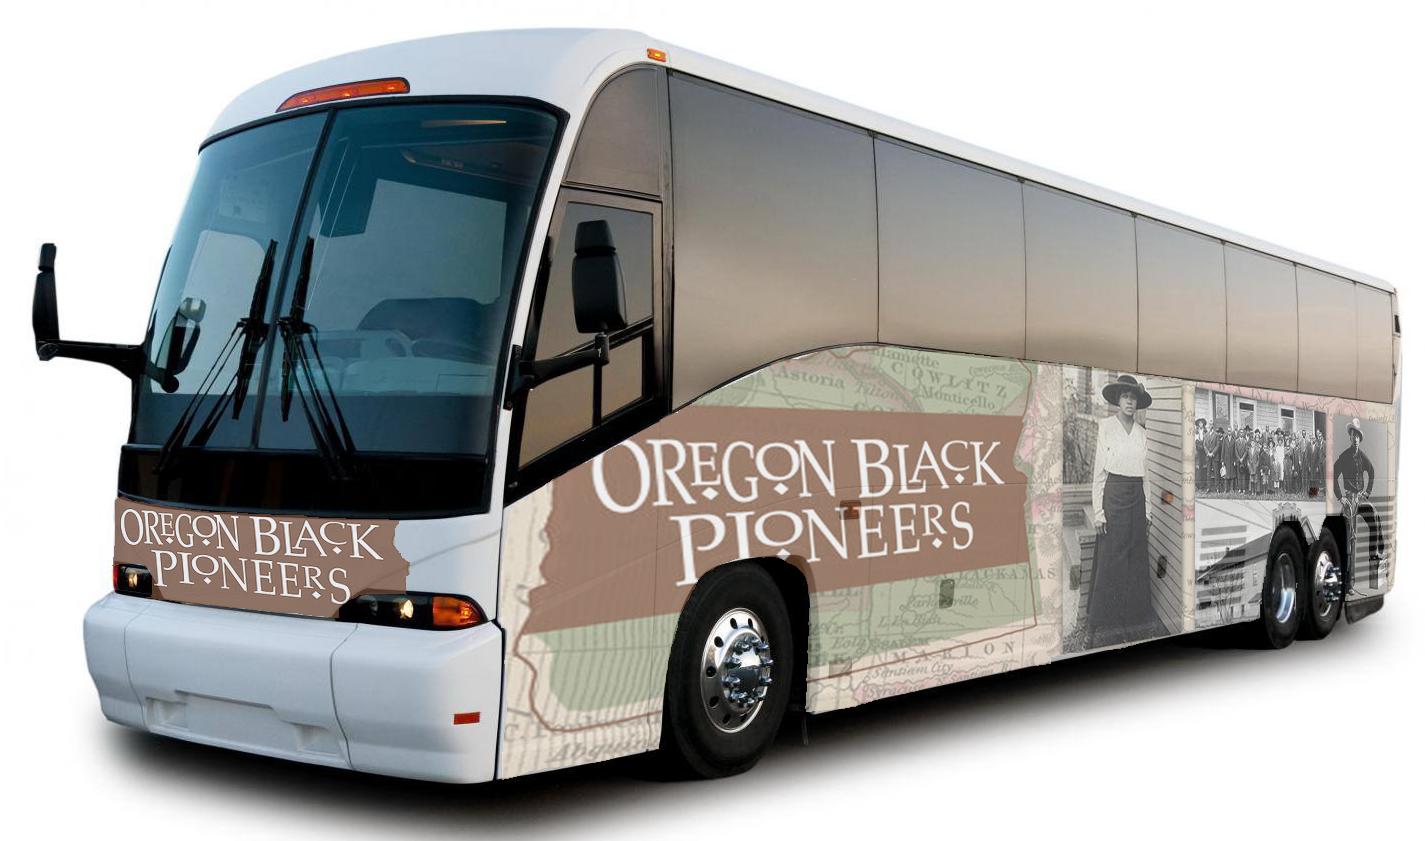 obp-bus-2016